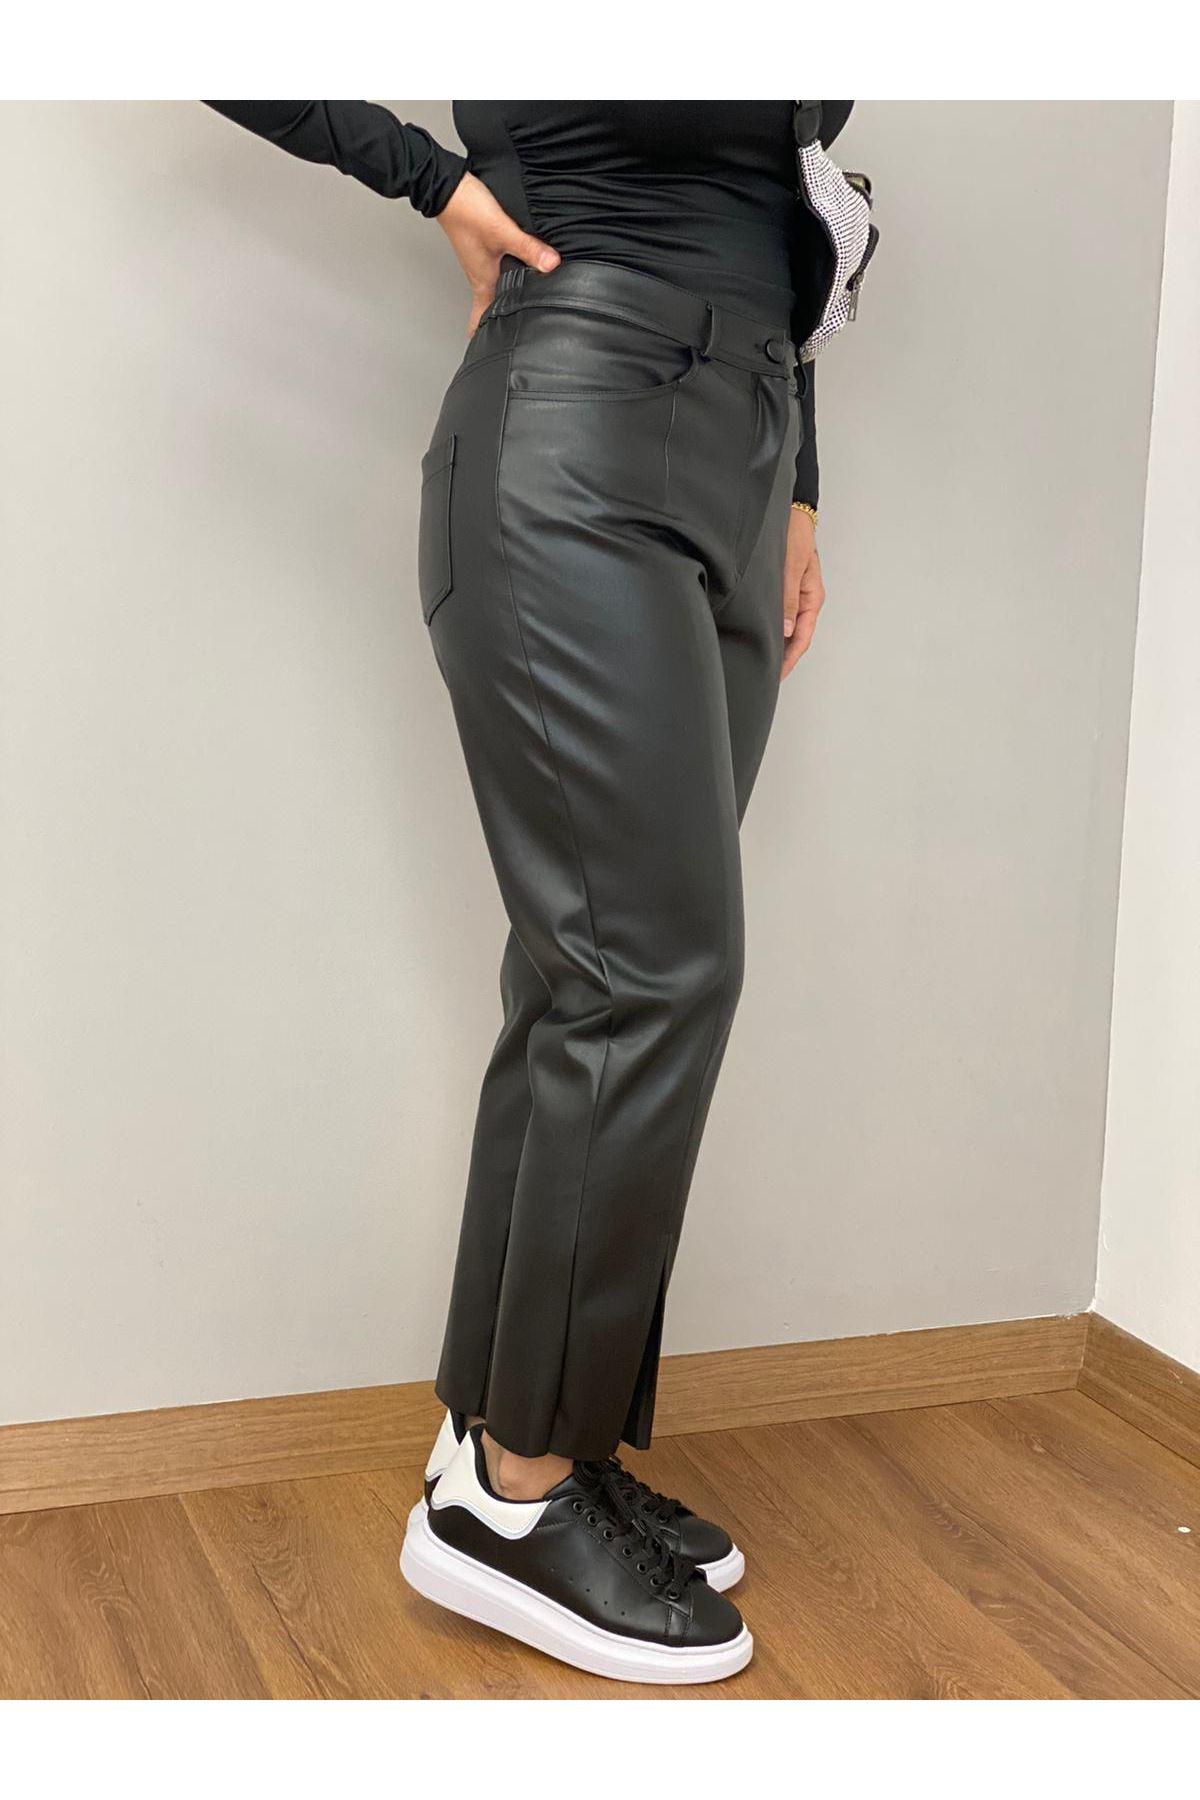 Siyah Yüksek Bel Deri Pantolon